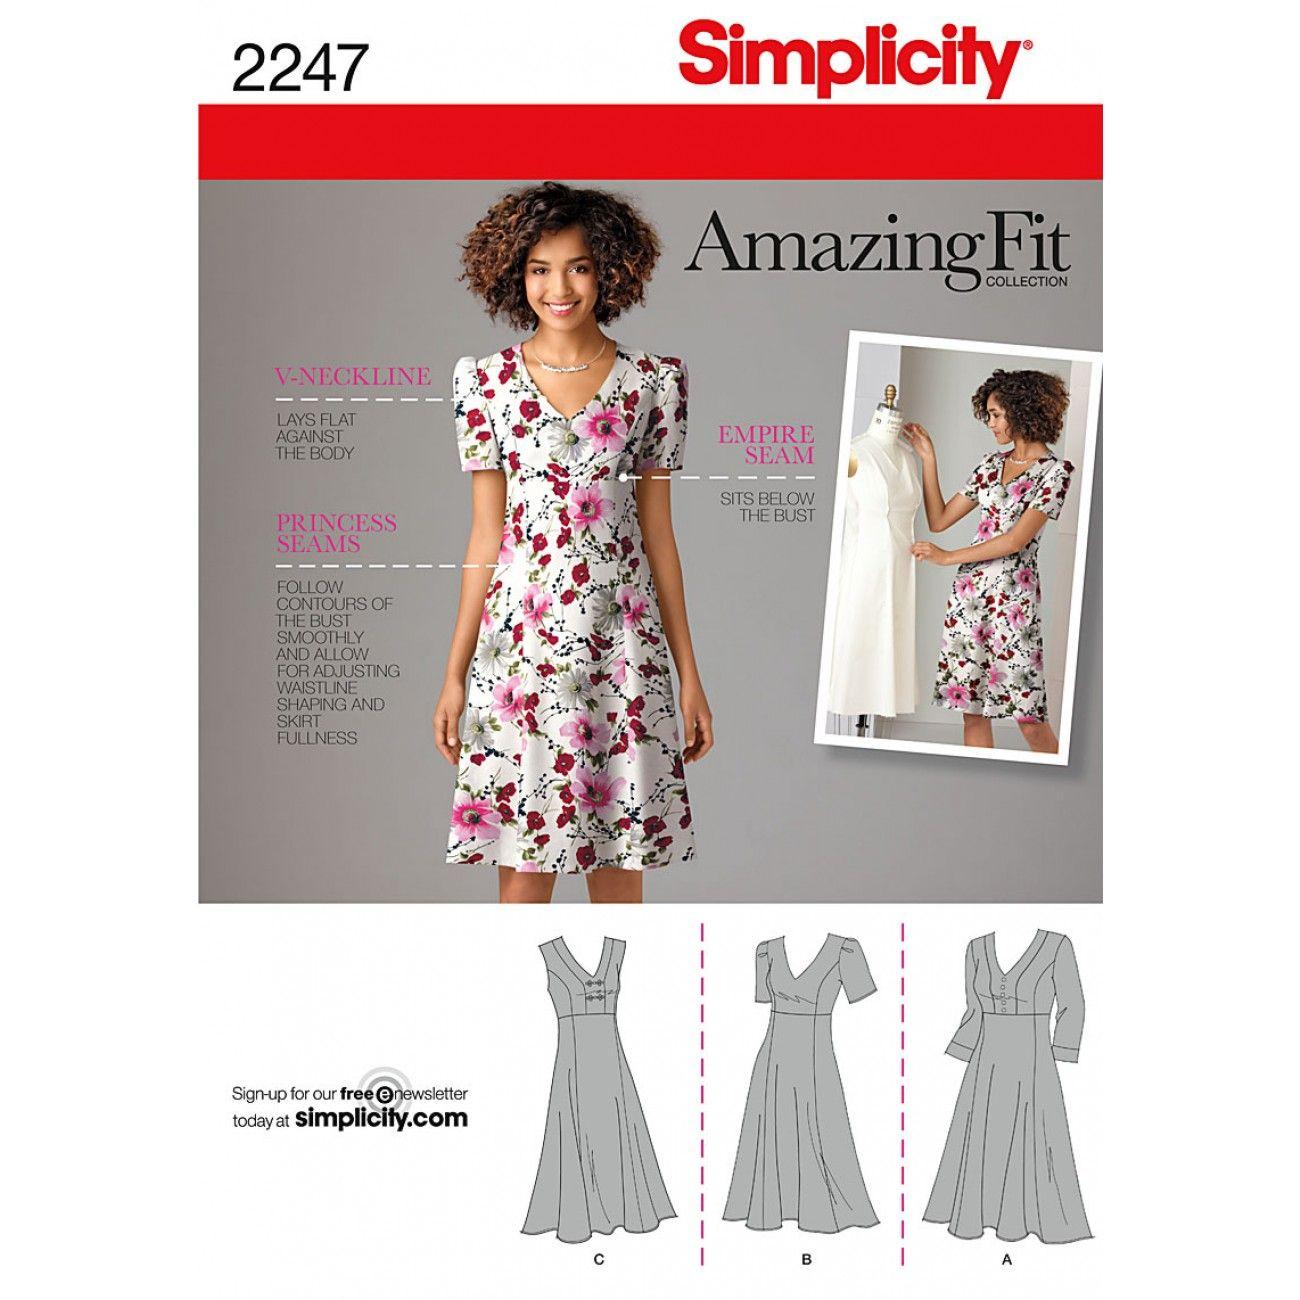 Simplicity pattern patterns fabric patterns shop online simplicity pattern patterns fabric patterns shop online lincraft simplicity sewing jeuxipadfo Gallery